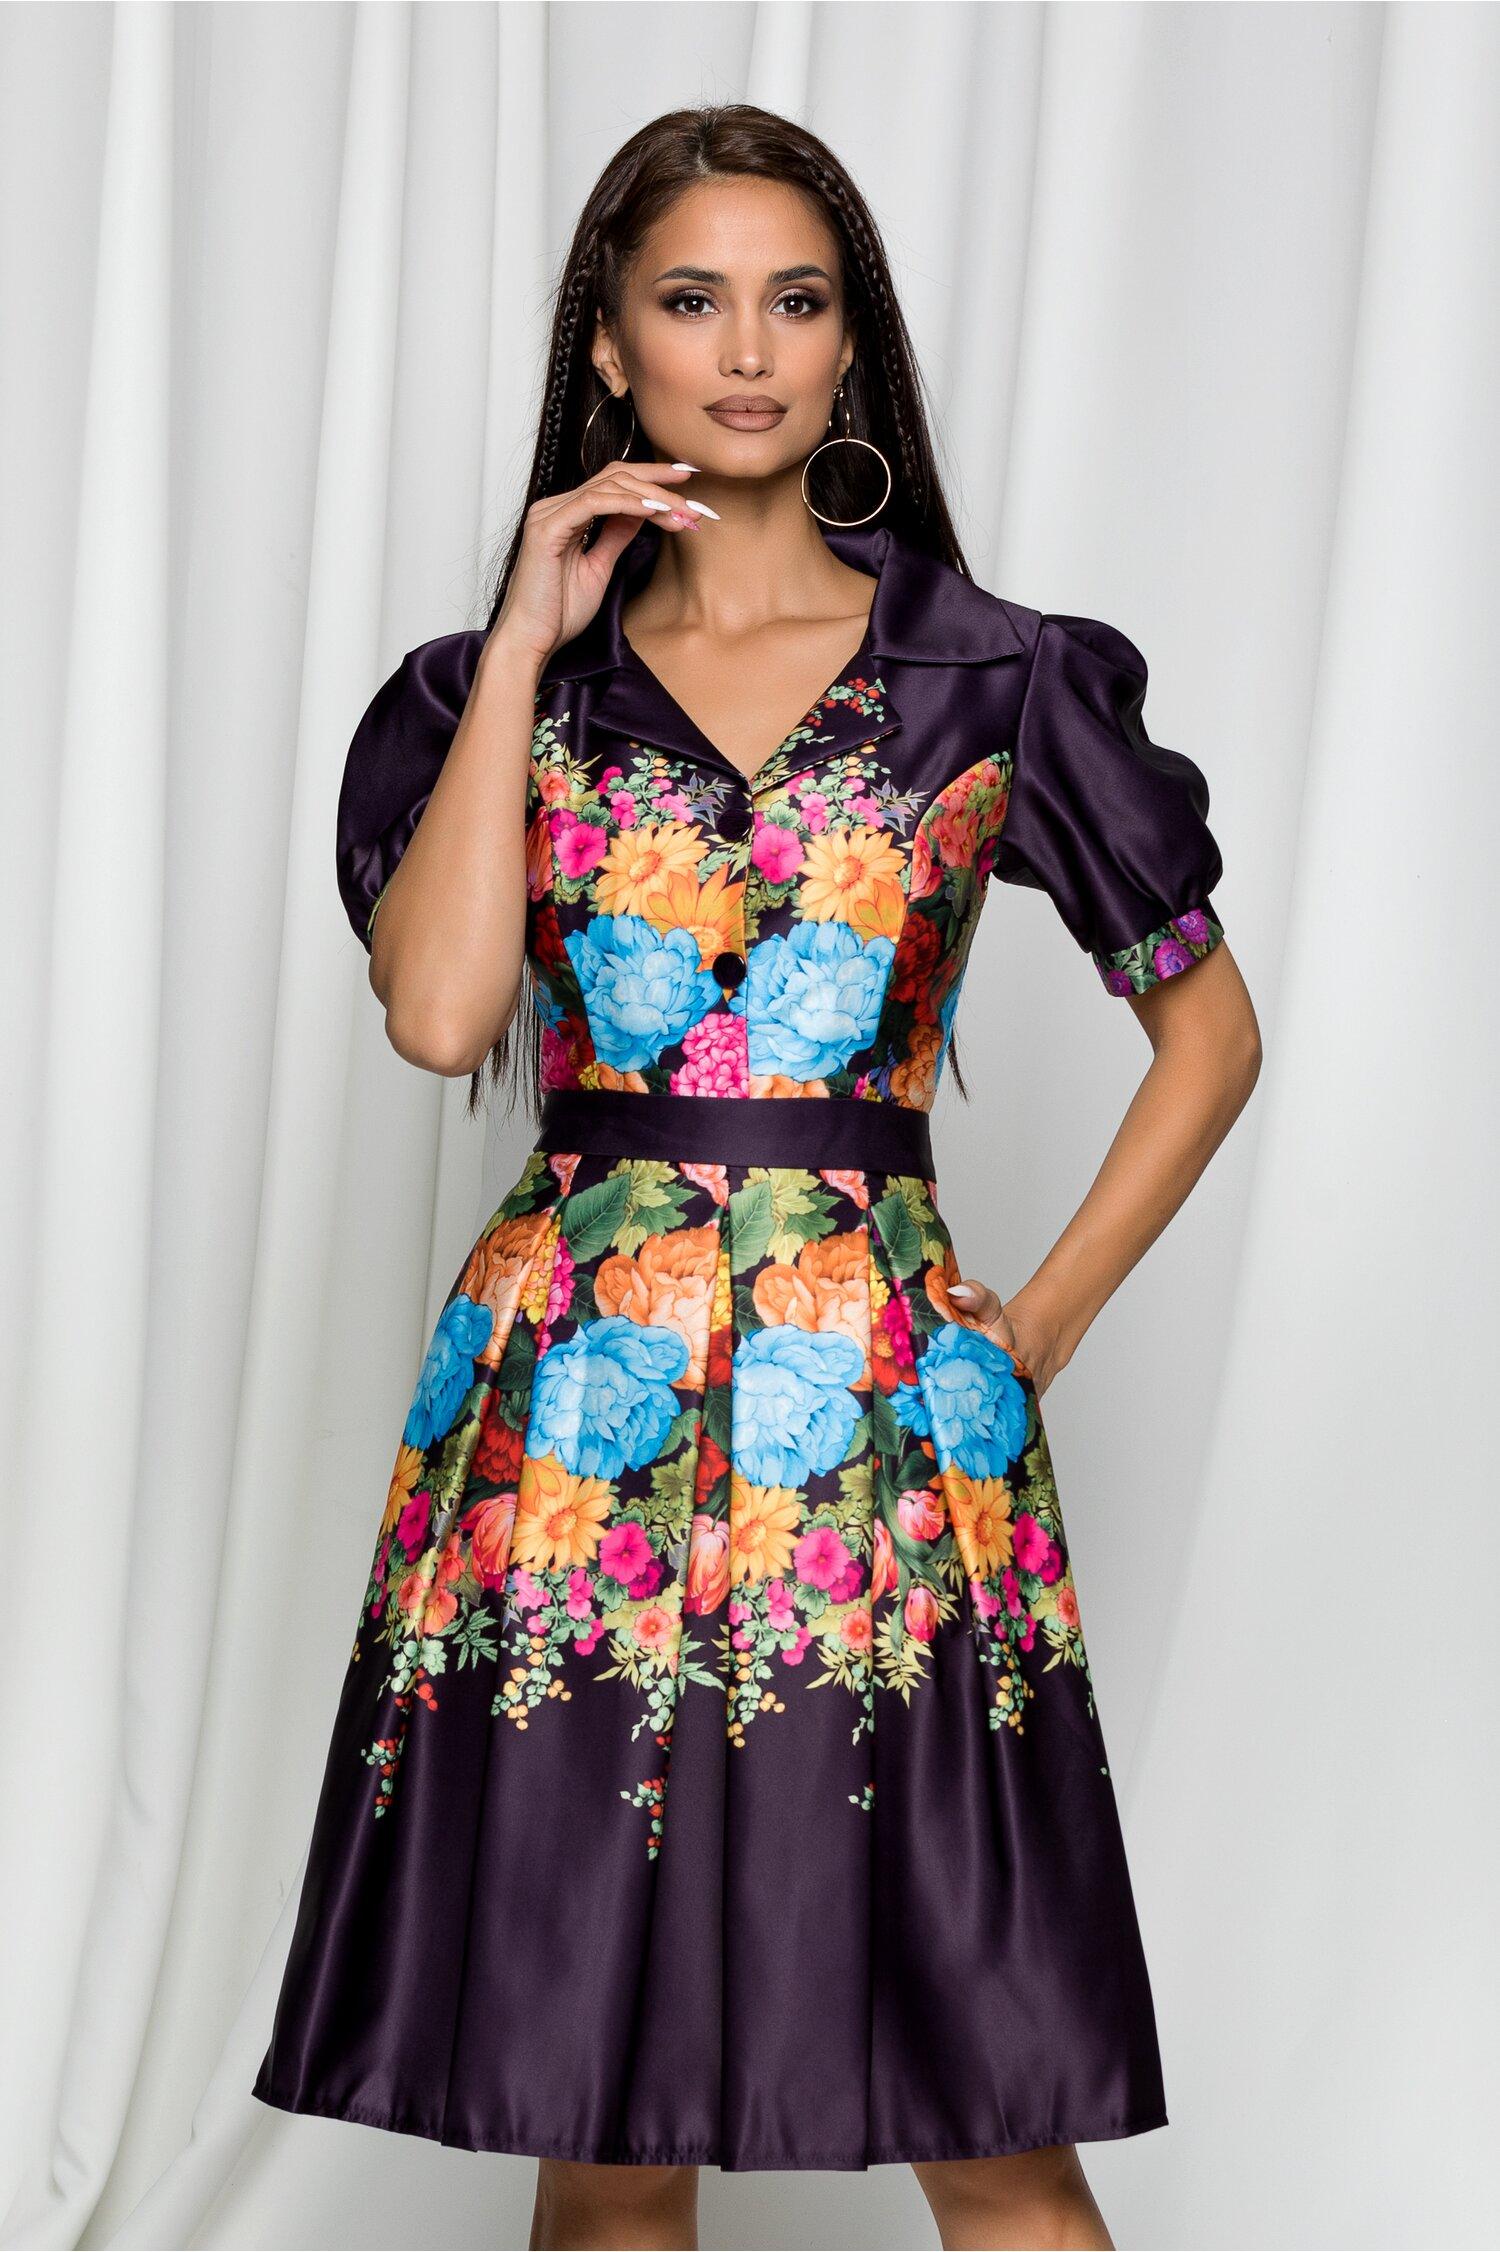 Rochie Iasmina mov cu imprimeu floral multicolor